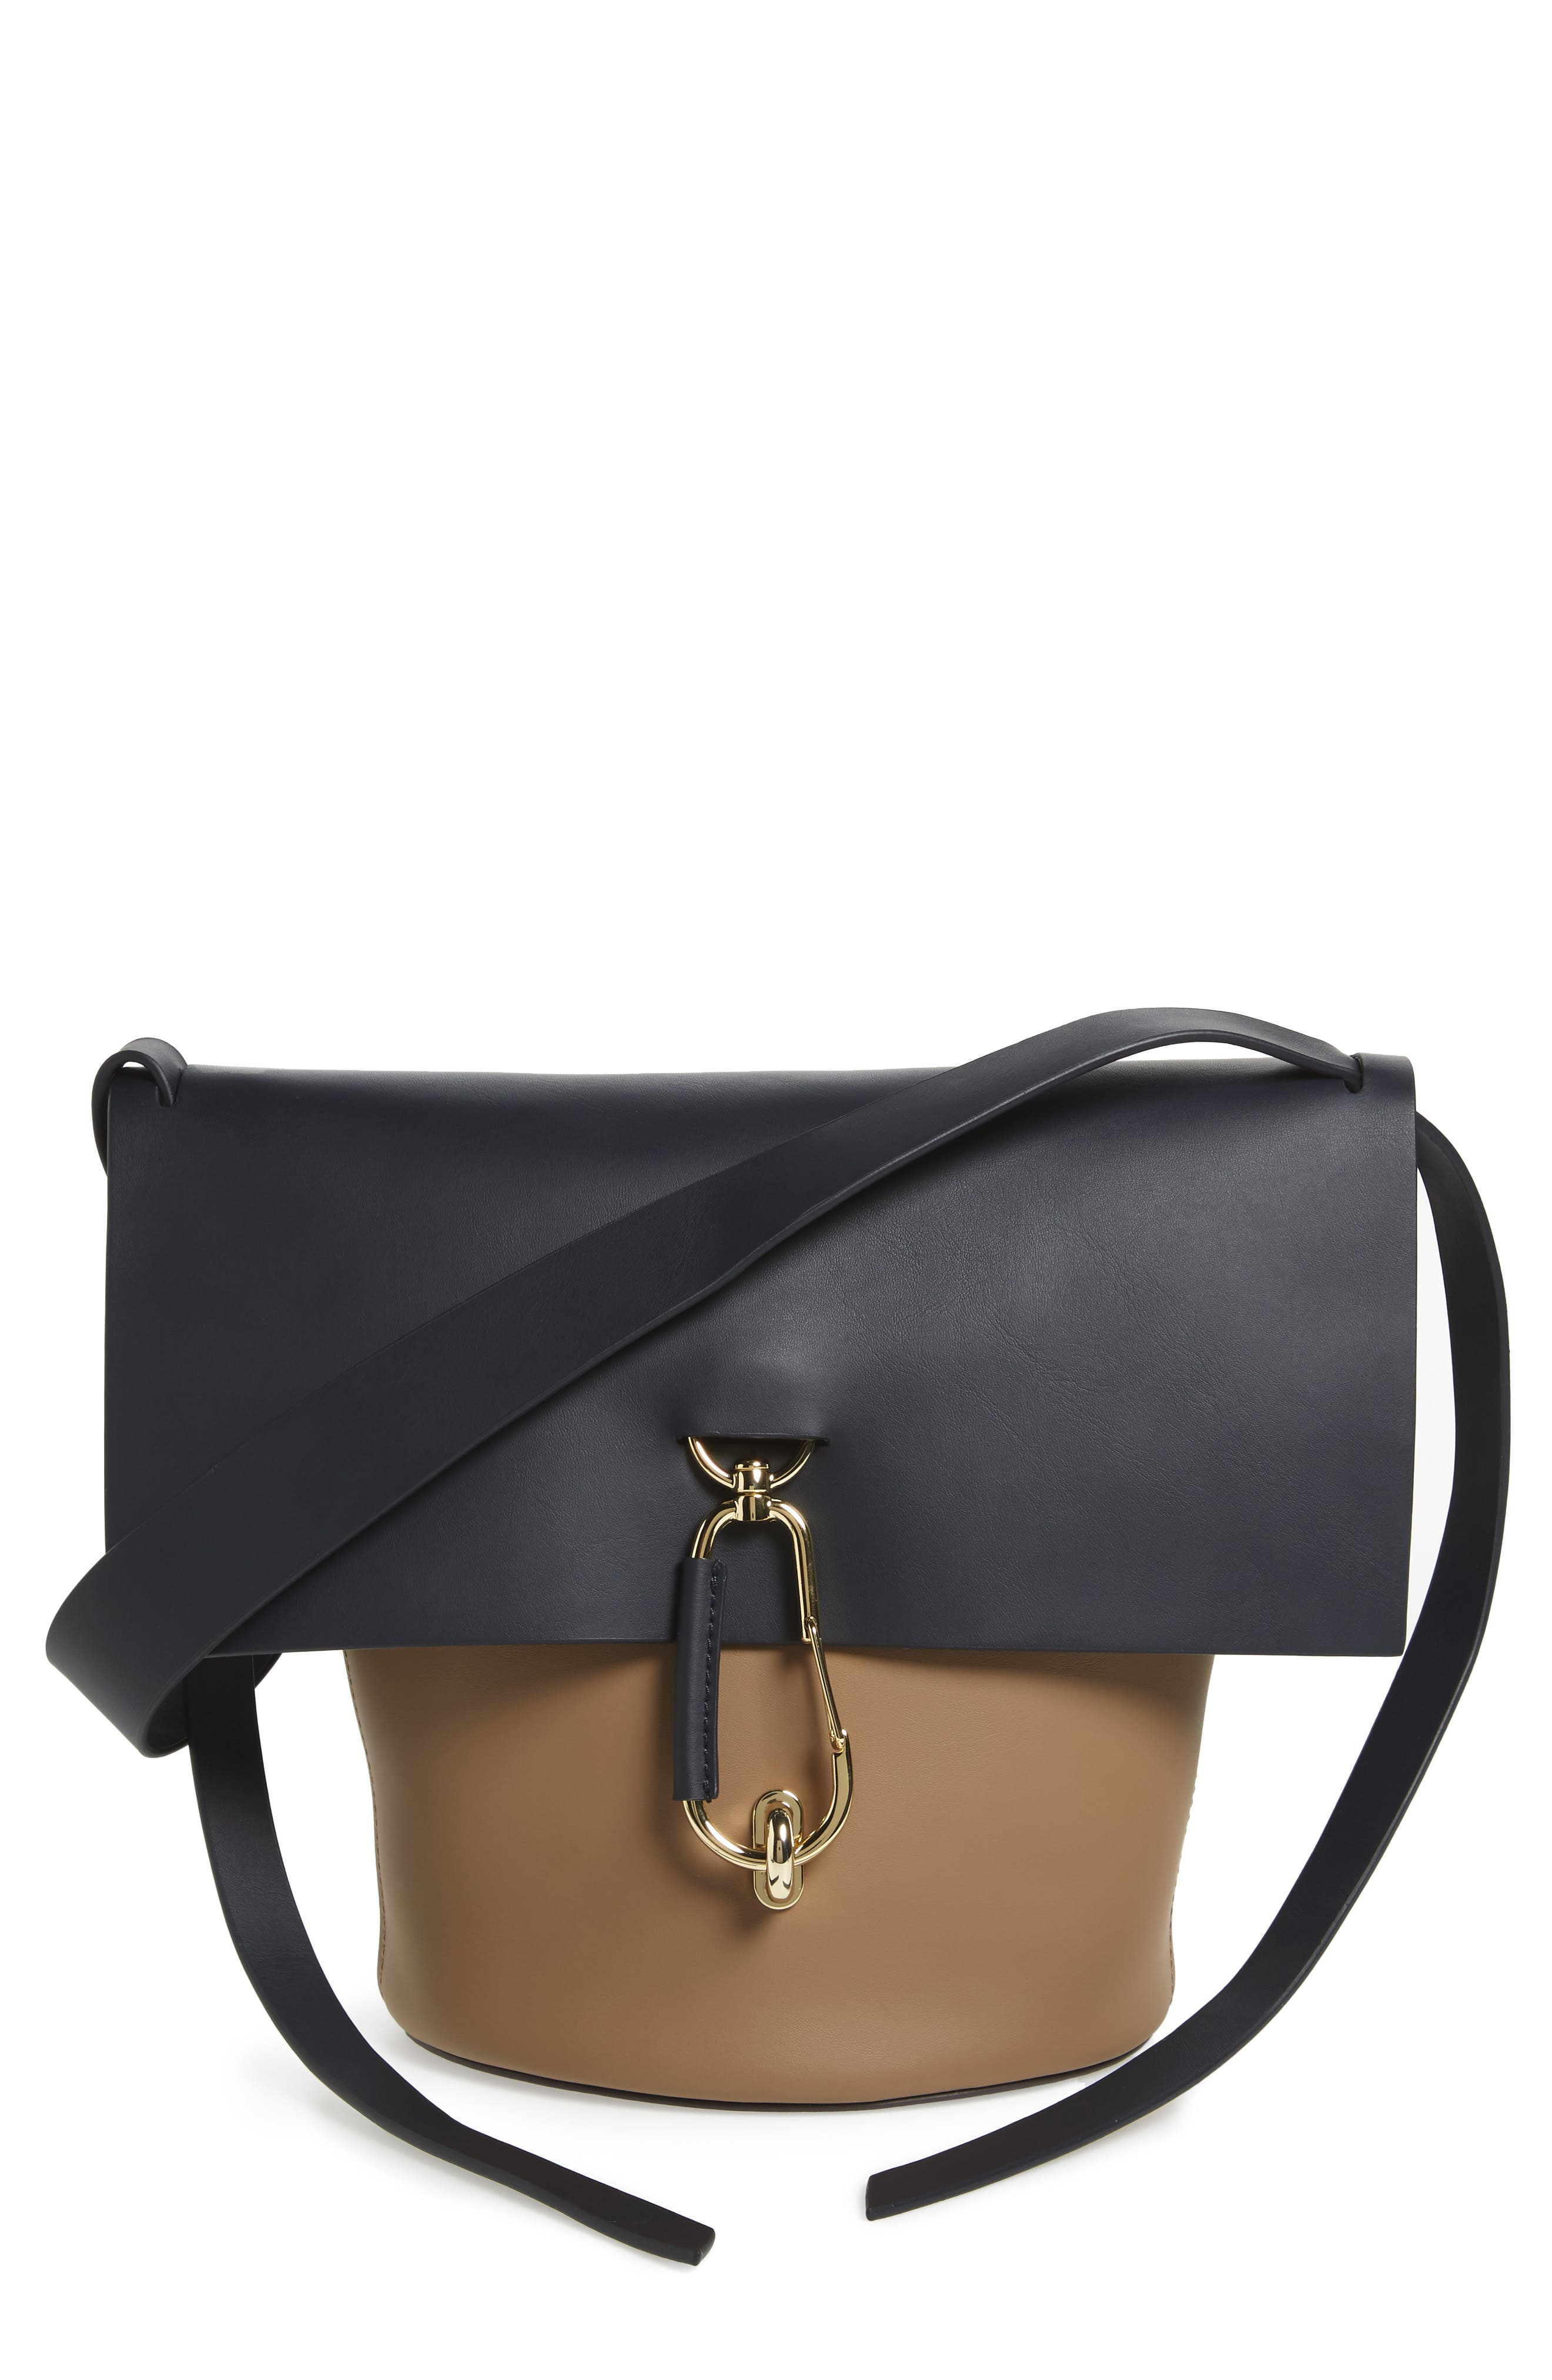 Main Image - ZAC Zac Posen Belay Colorblock Calfskin Leather Bucket Bag